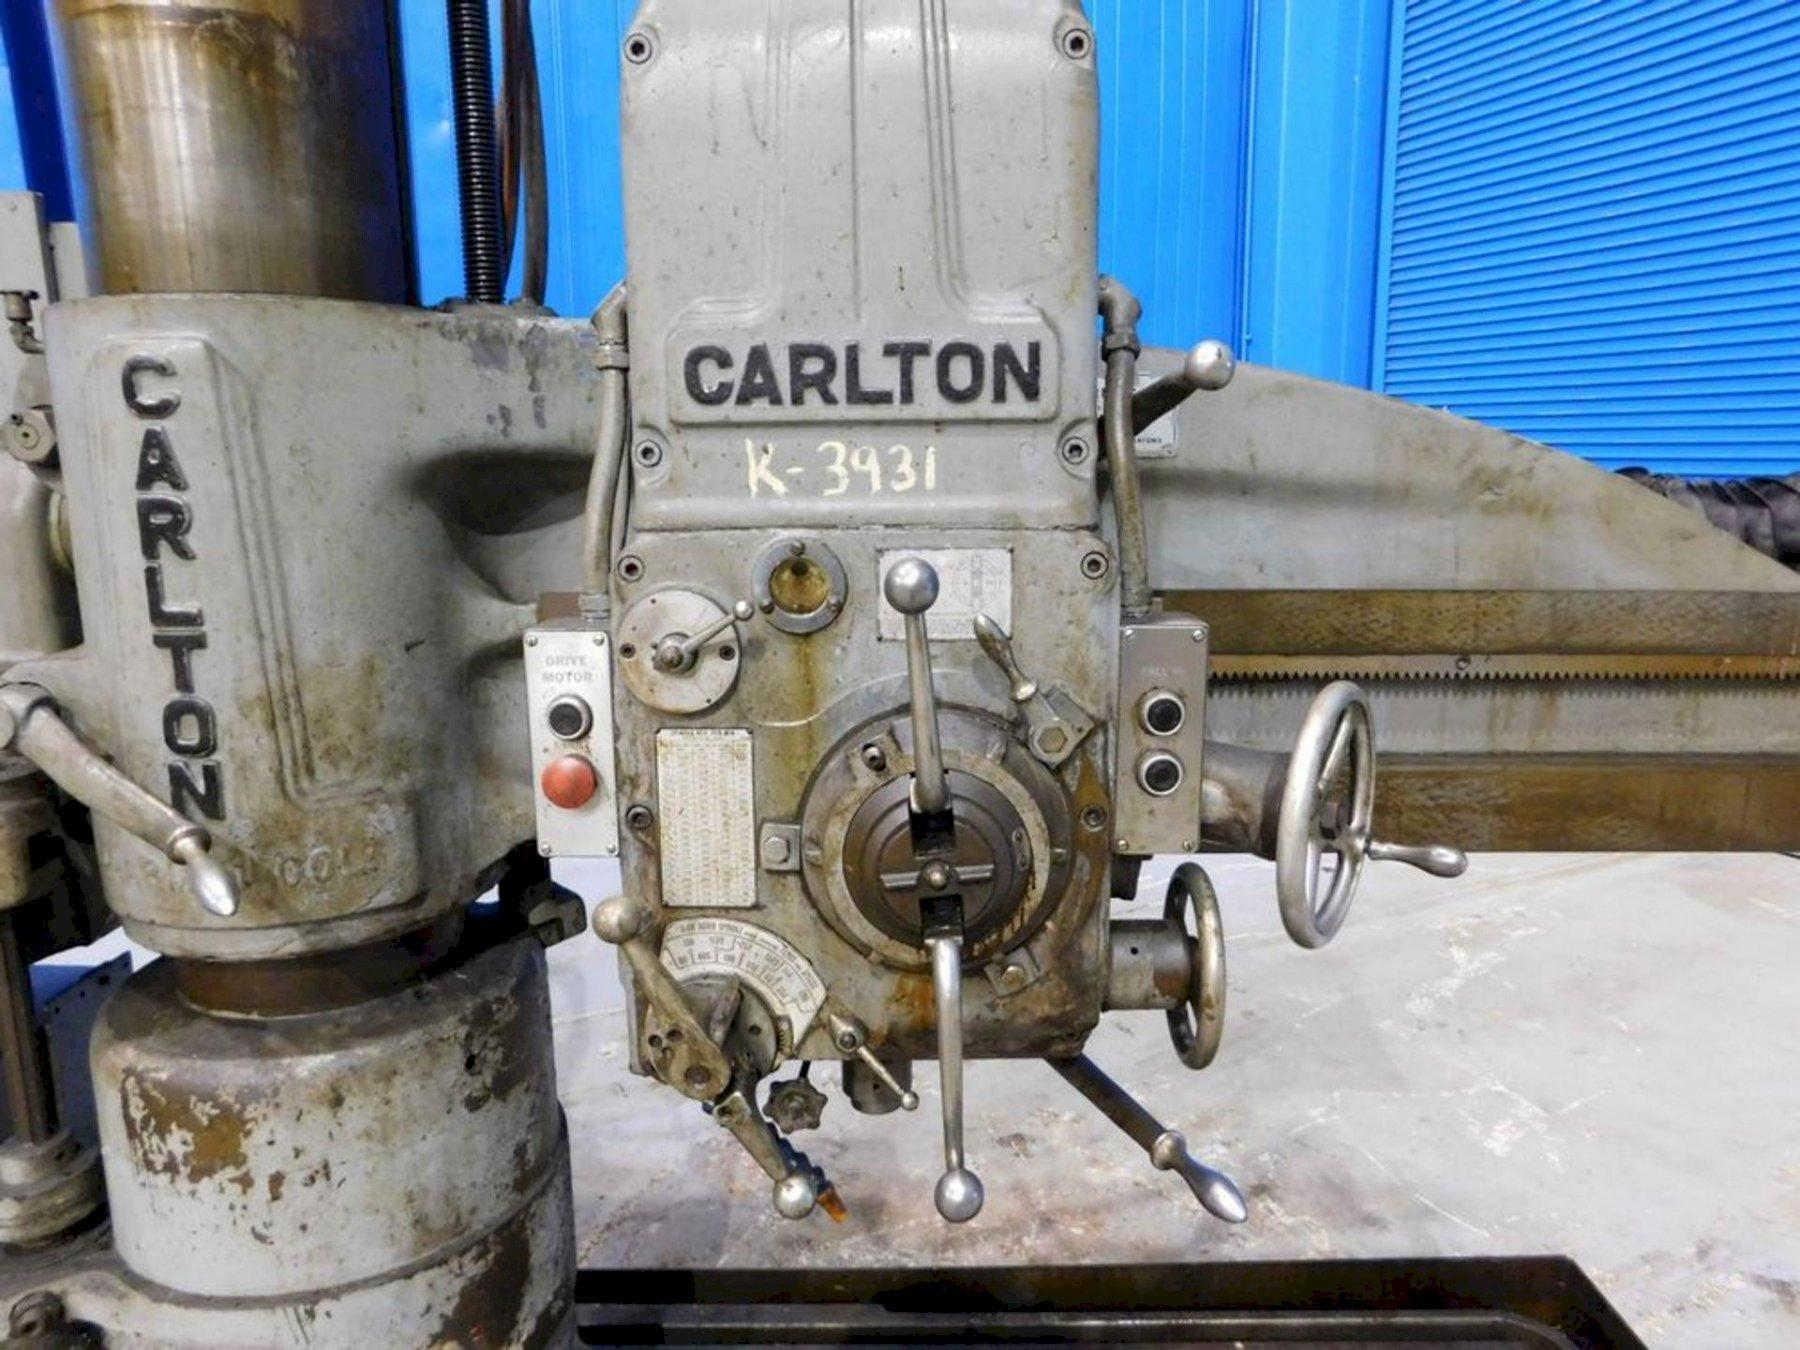 "4'  X 9"" CARLTON 1A RADIAL ARM DRILL. STOCK # 0738521"